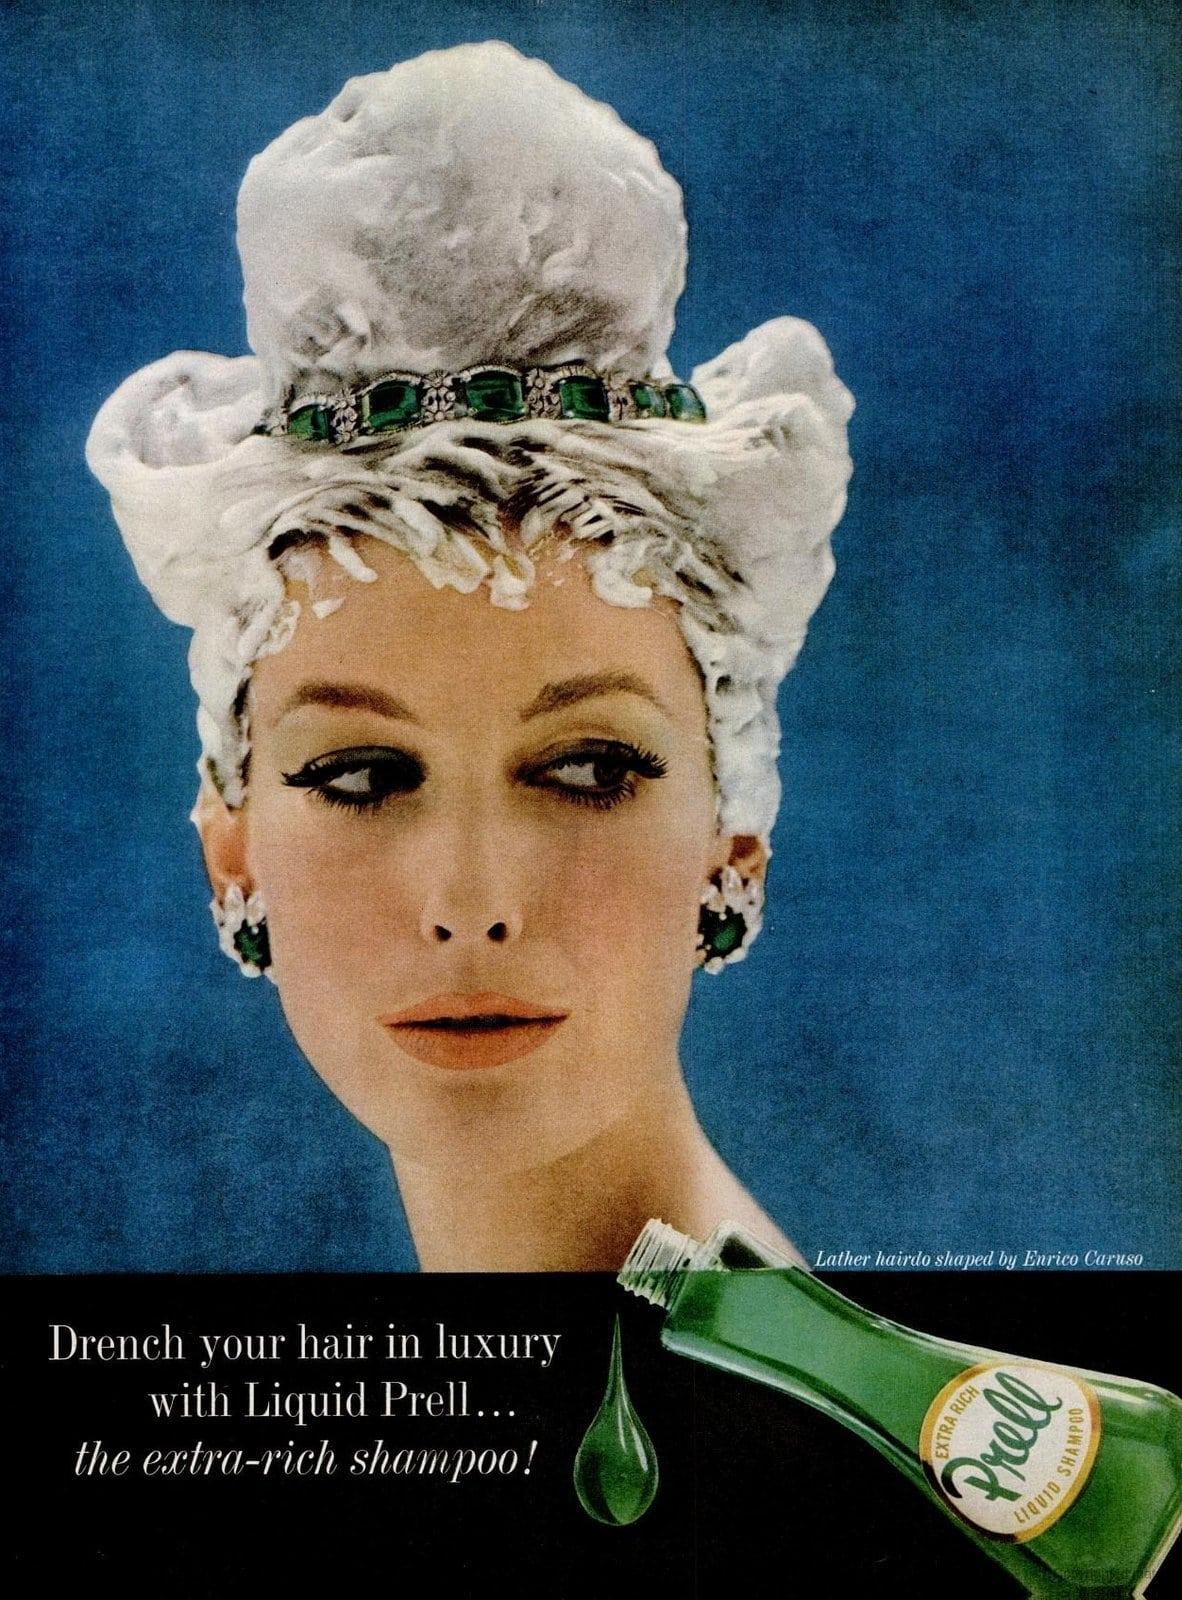 Vintage Prell shampoo ad - 1960s